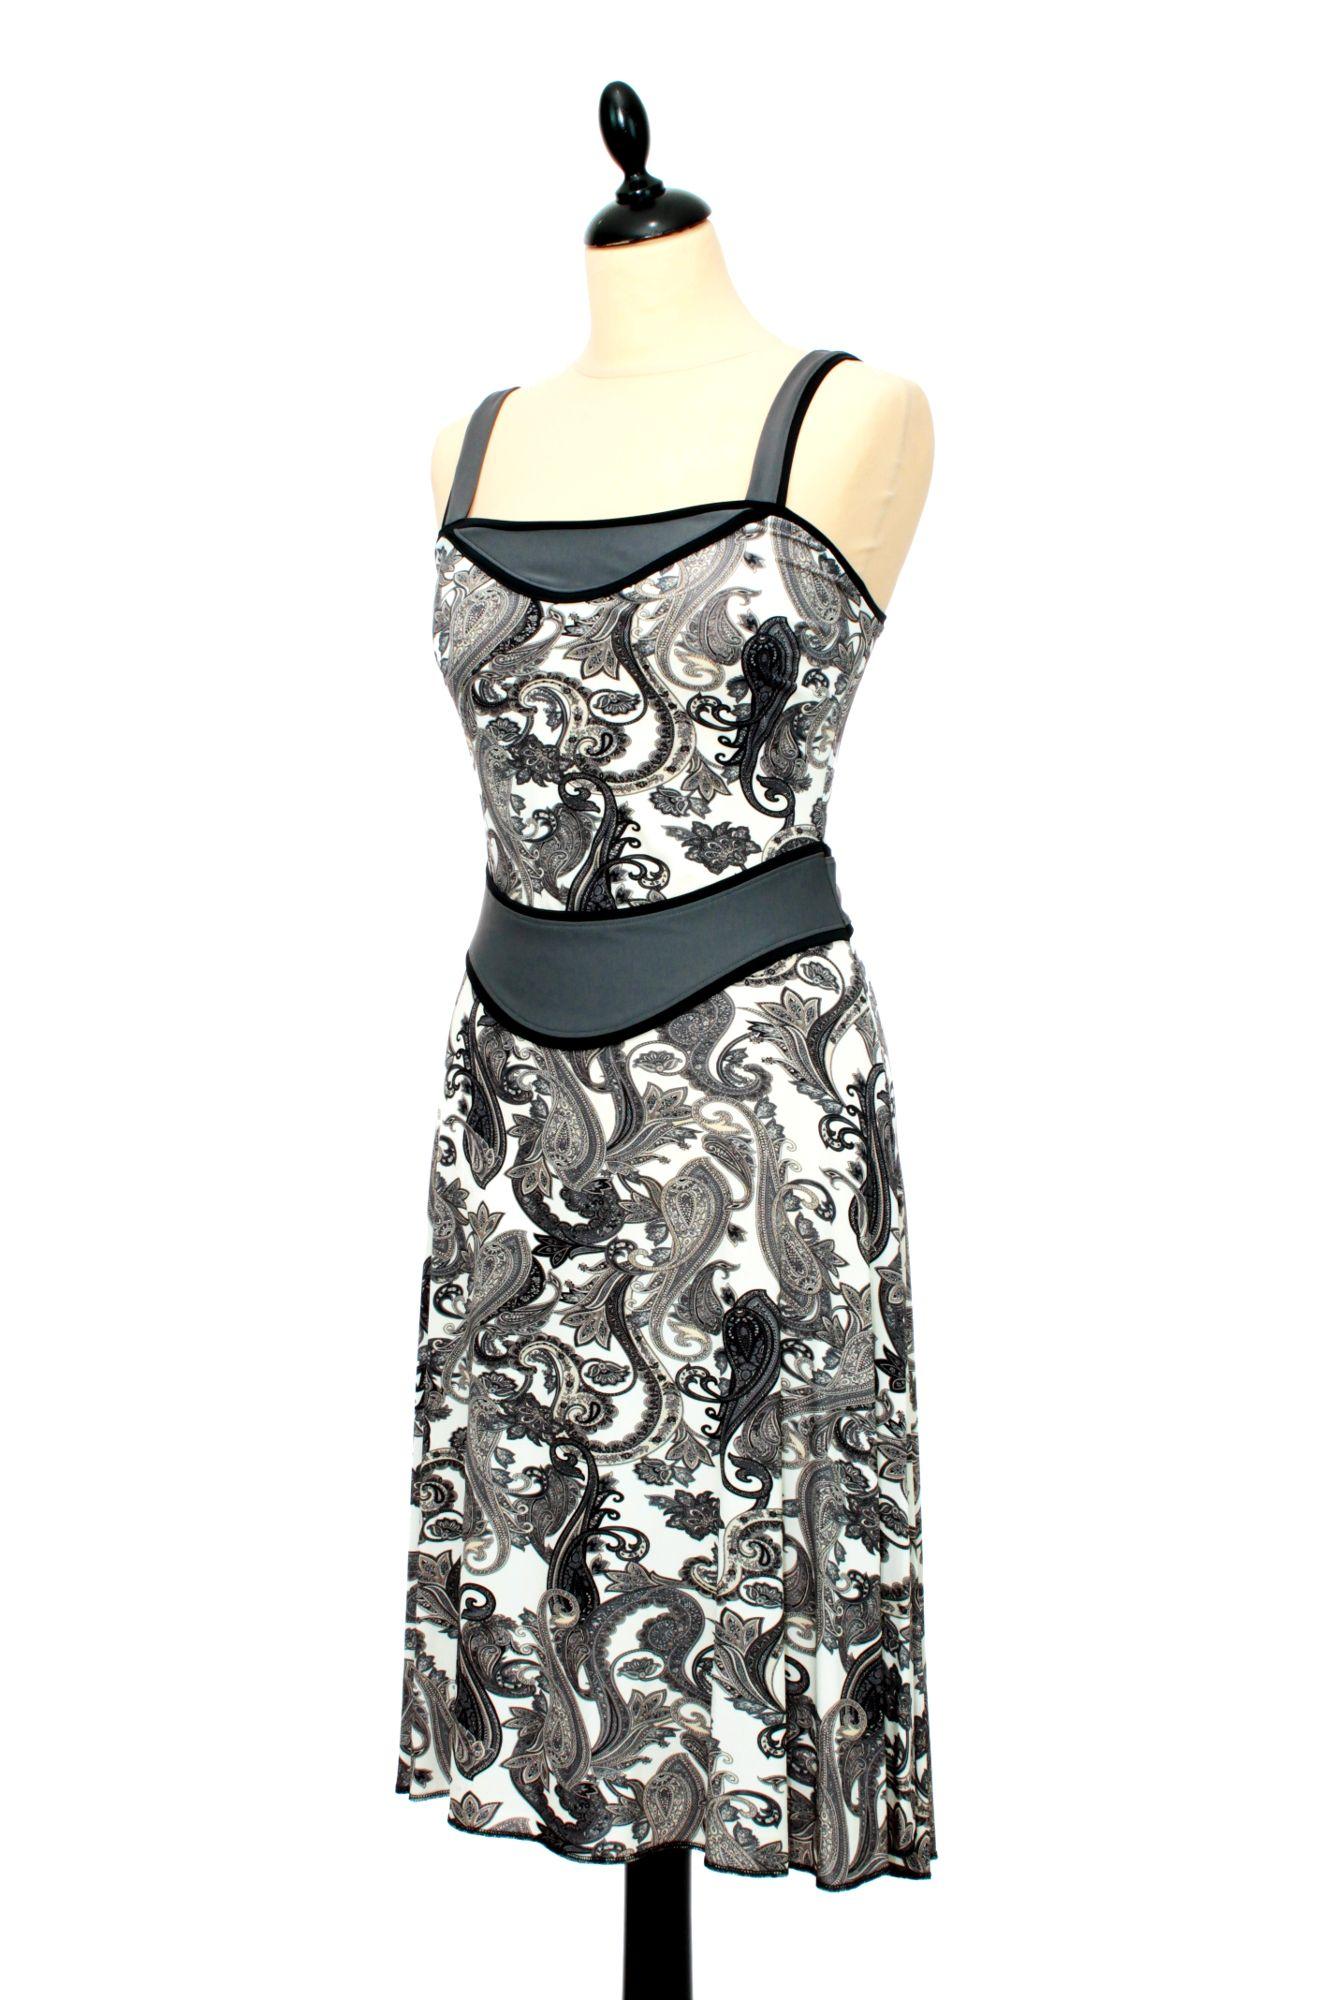 Magnifique Robe de Tango | Magnificent Tango Dress by IRYNA ...